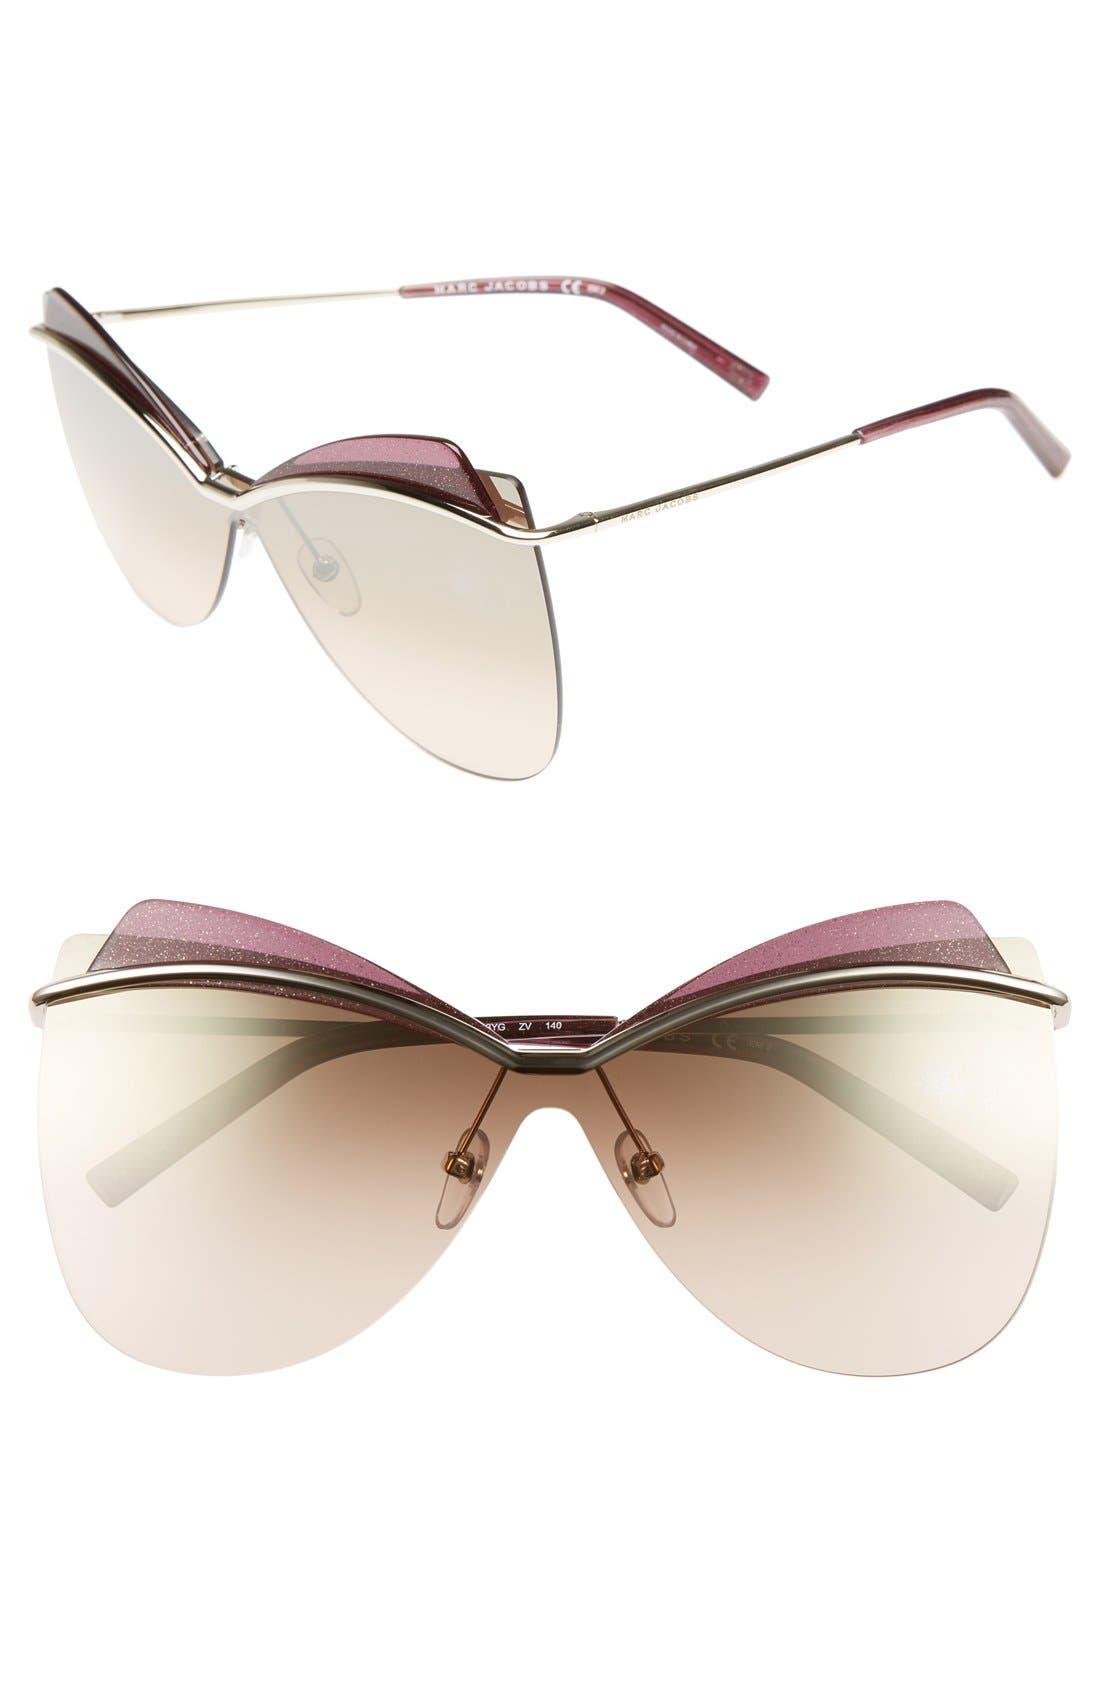 67mm Sunglasses,                             Main thumbnail 1, color,